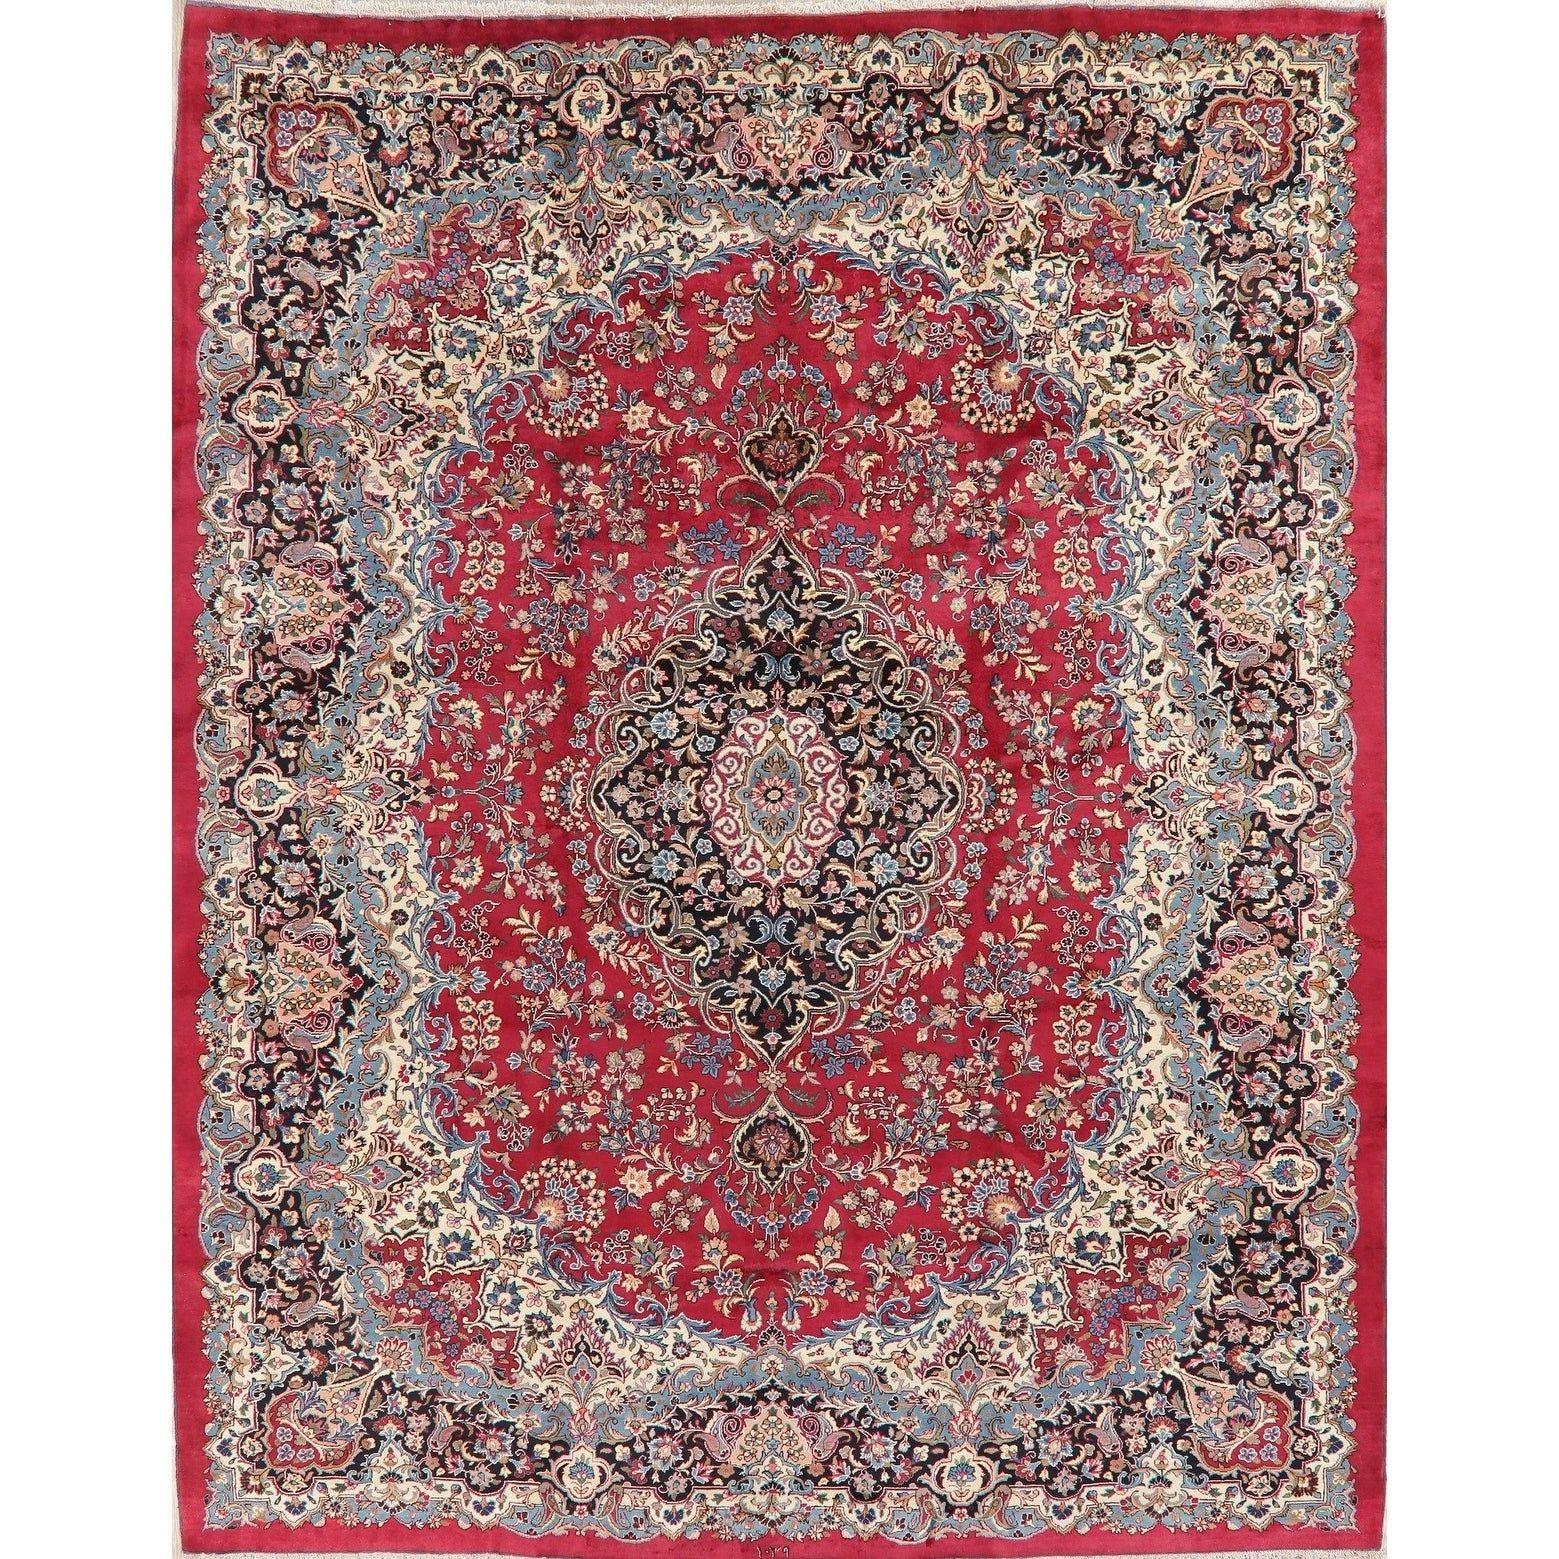 Refurbished Decorative Floral Red Kerman Persian Area Rug Handmade Oriental Carpet 9 10 X 12 5 9 10 X 12 5 Red Wool Floral Botanical In 2019 Rugs Handmade Rugs Room Carpet